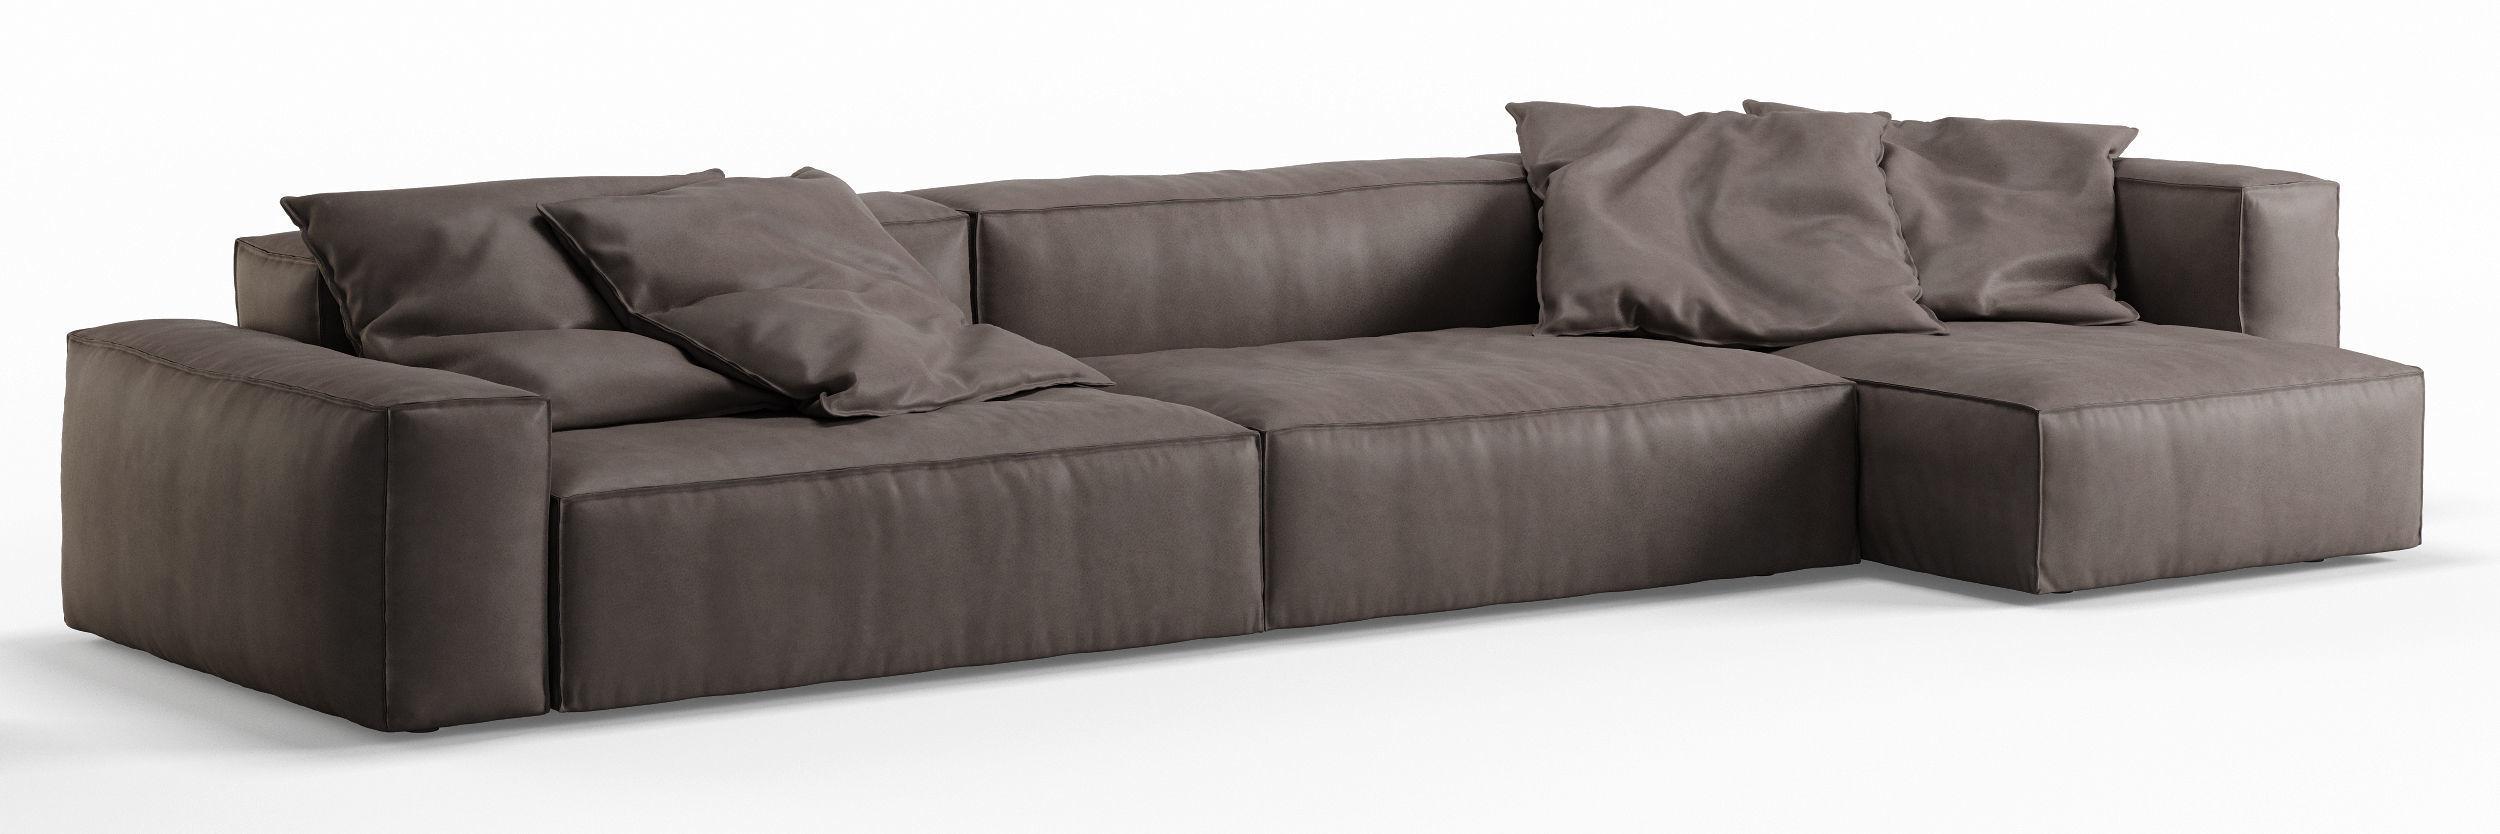 NeoWall Leather Corner Sofa by Living Divani   3D model